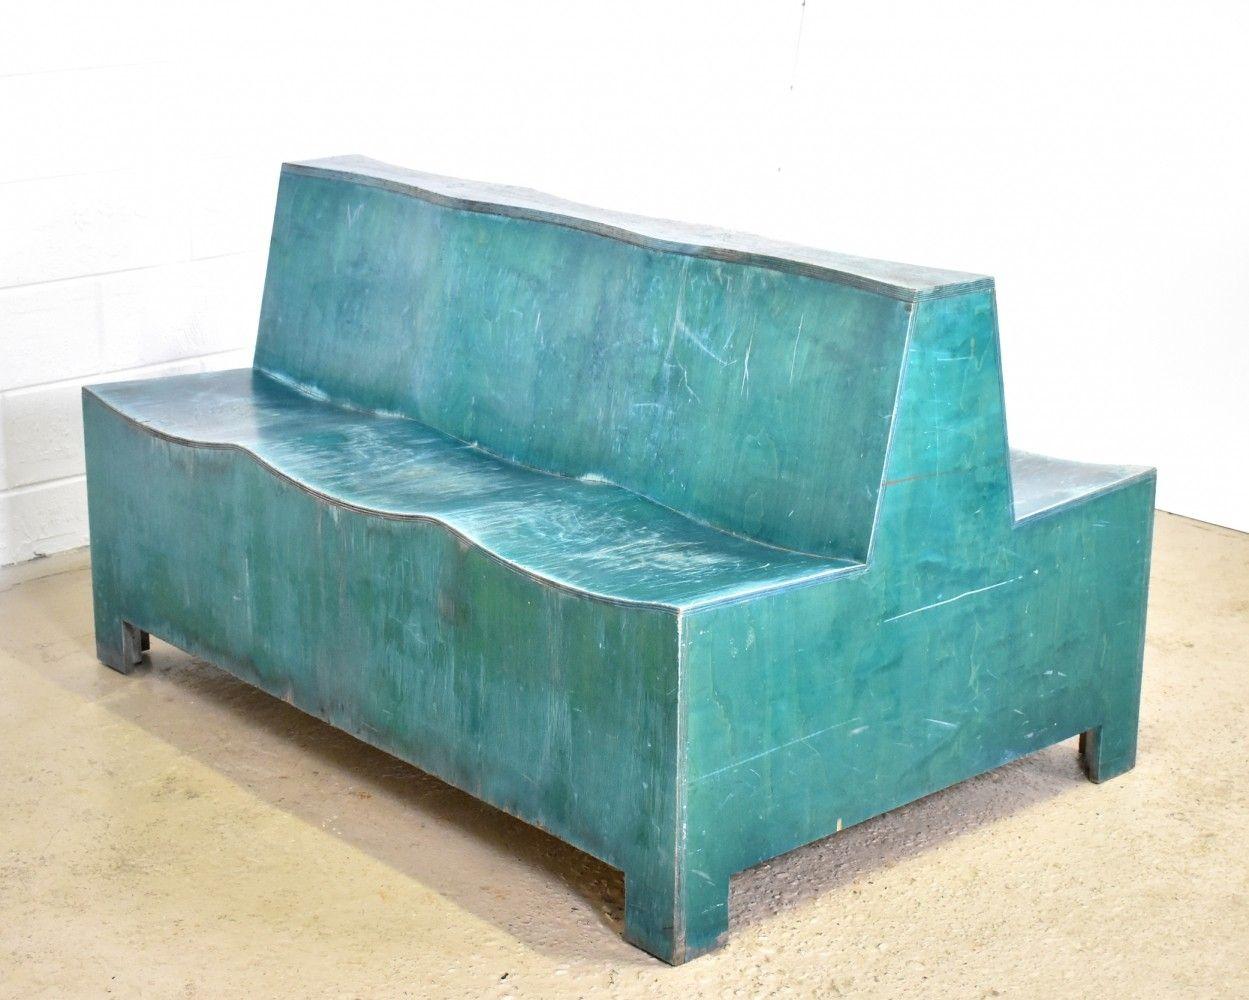 Piet Hein Eek Sofa 1990s Sofa Design Plywood For Sale Sofa Furniture